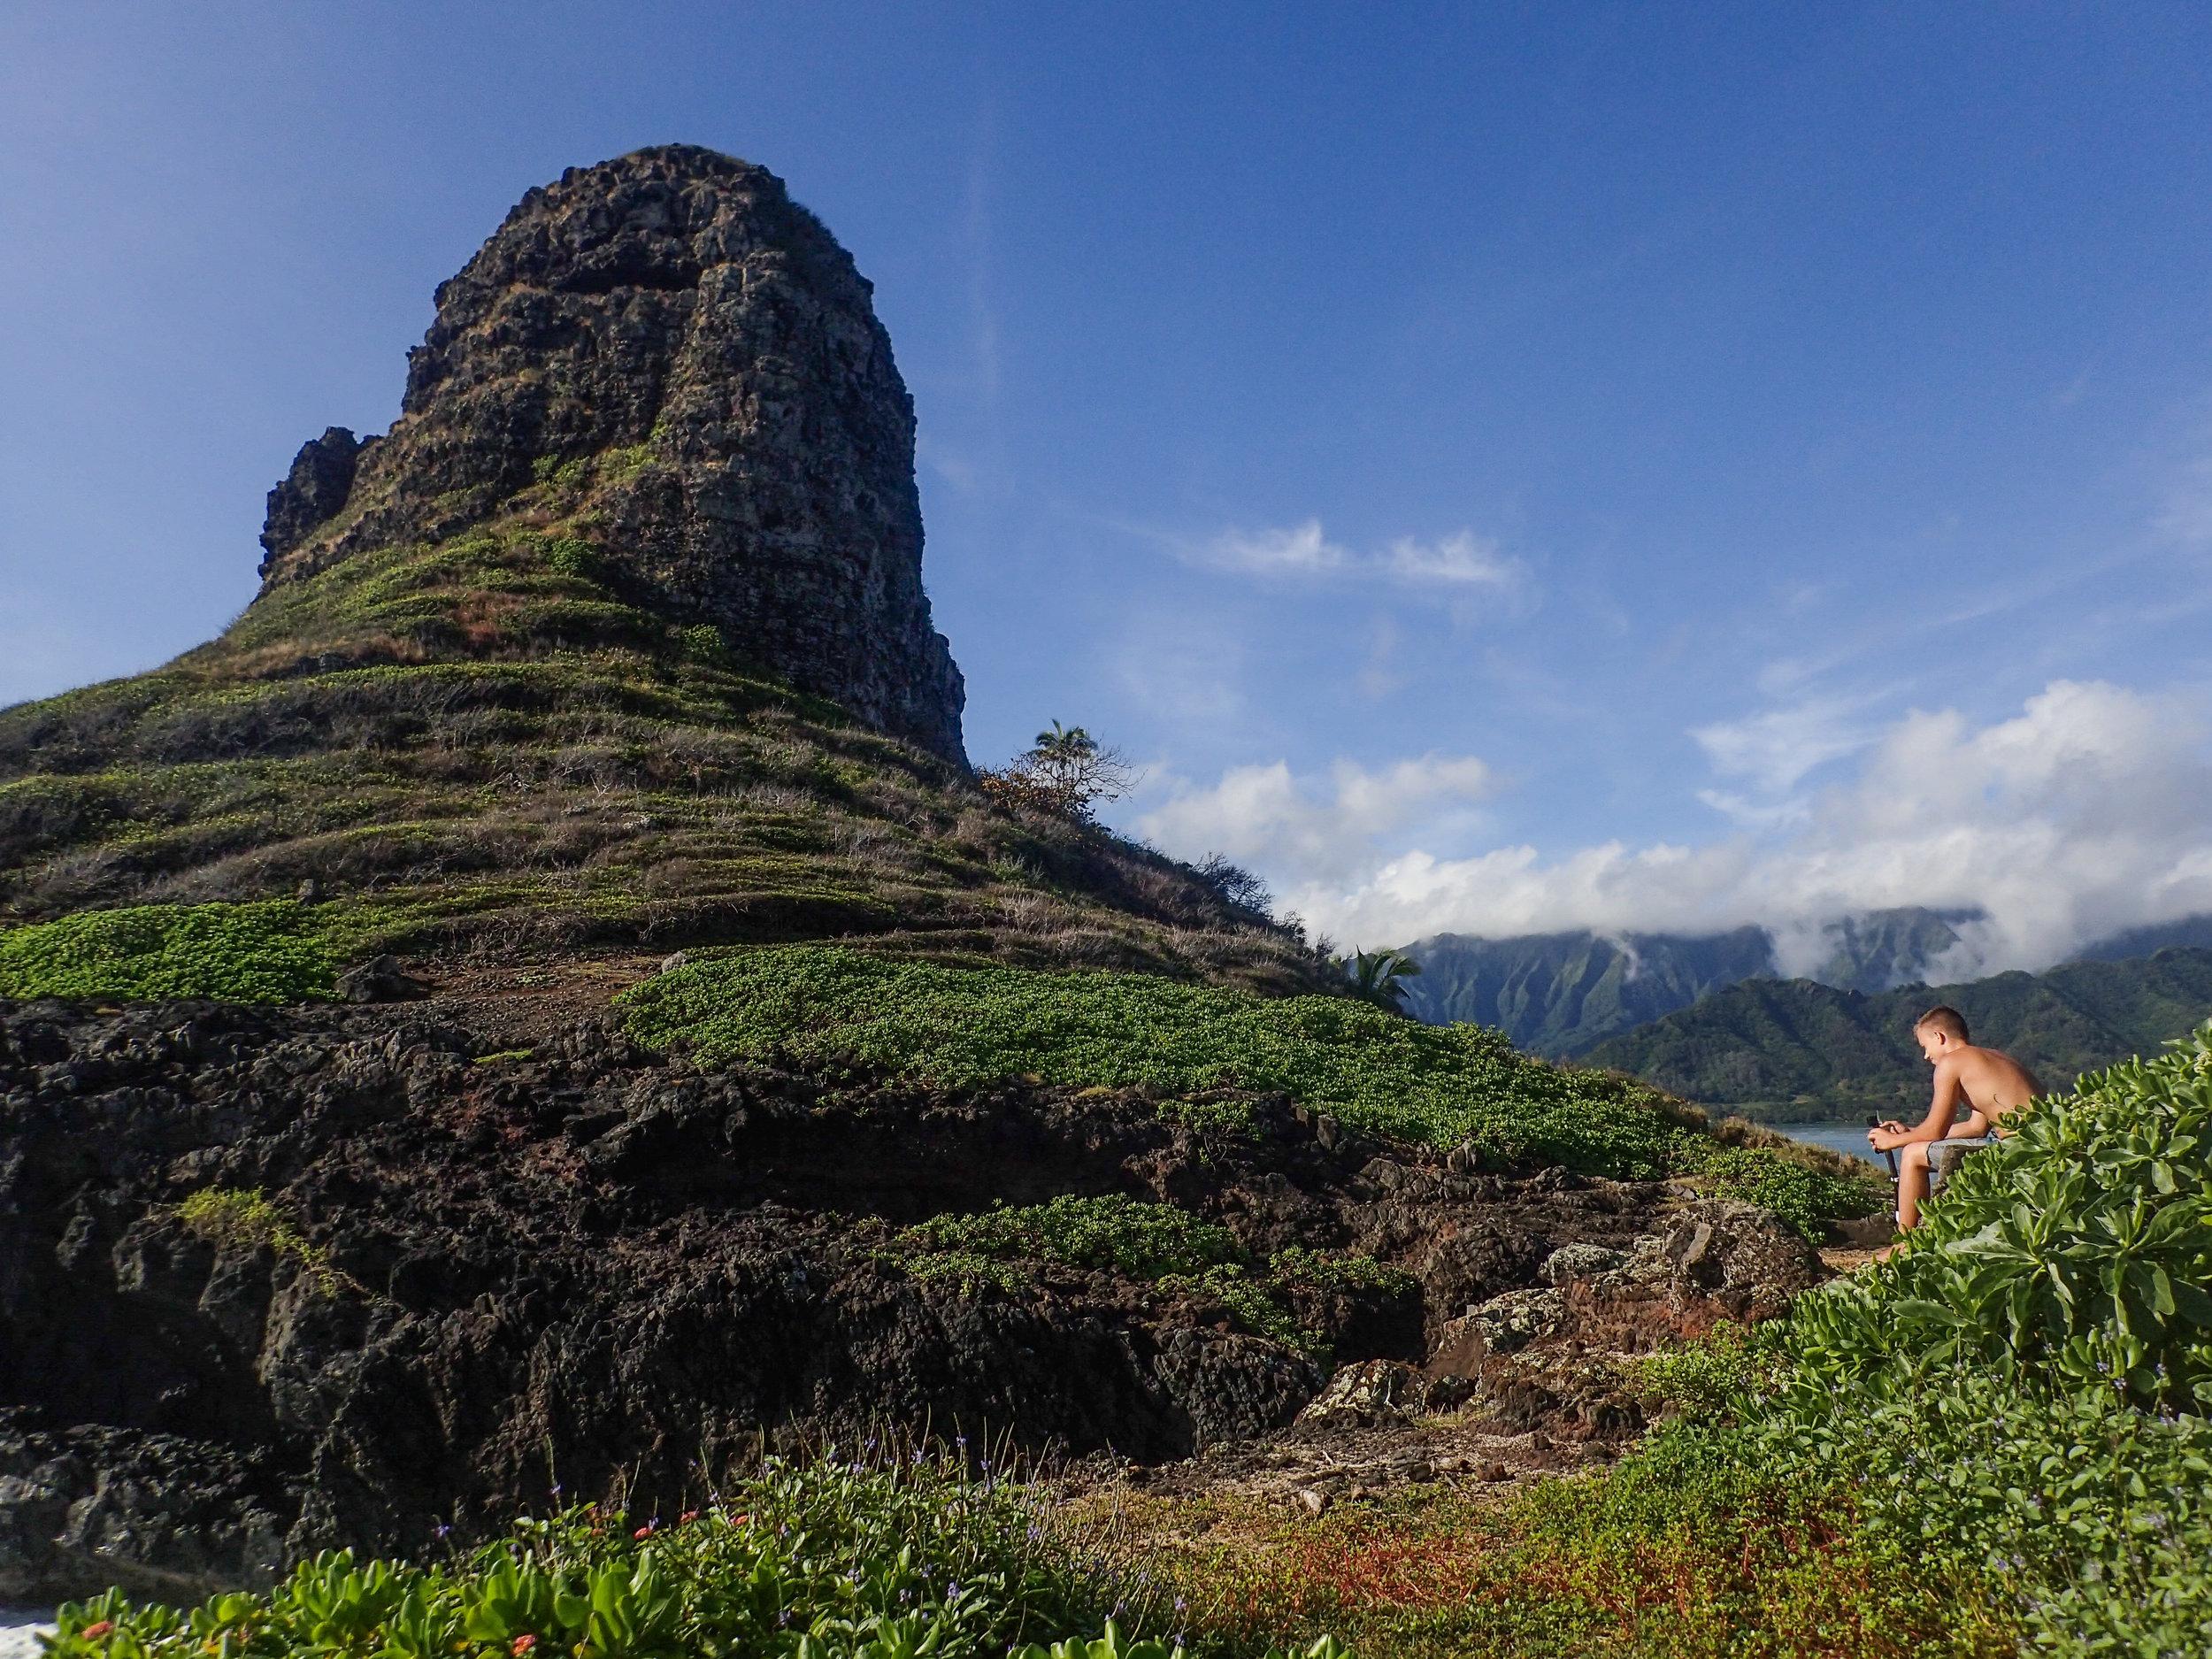 P_Tr_HI_Oahu_Olympus Images-254.jpg